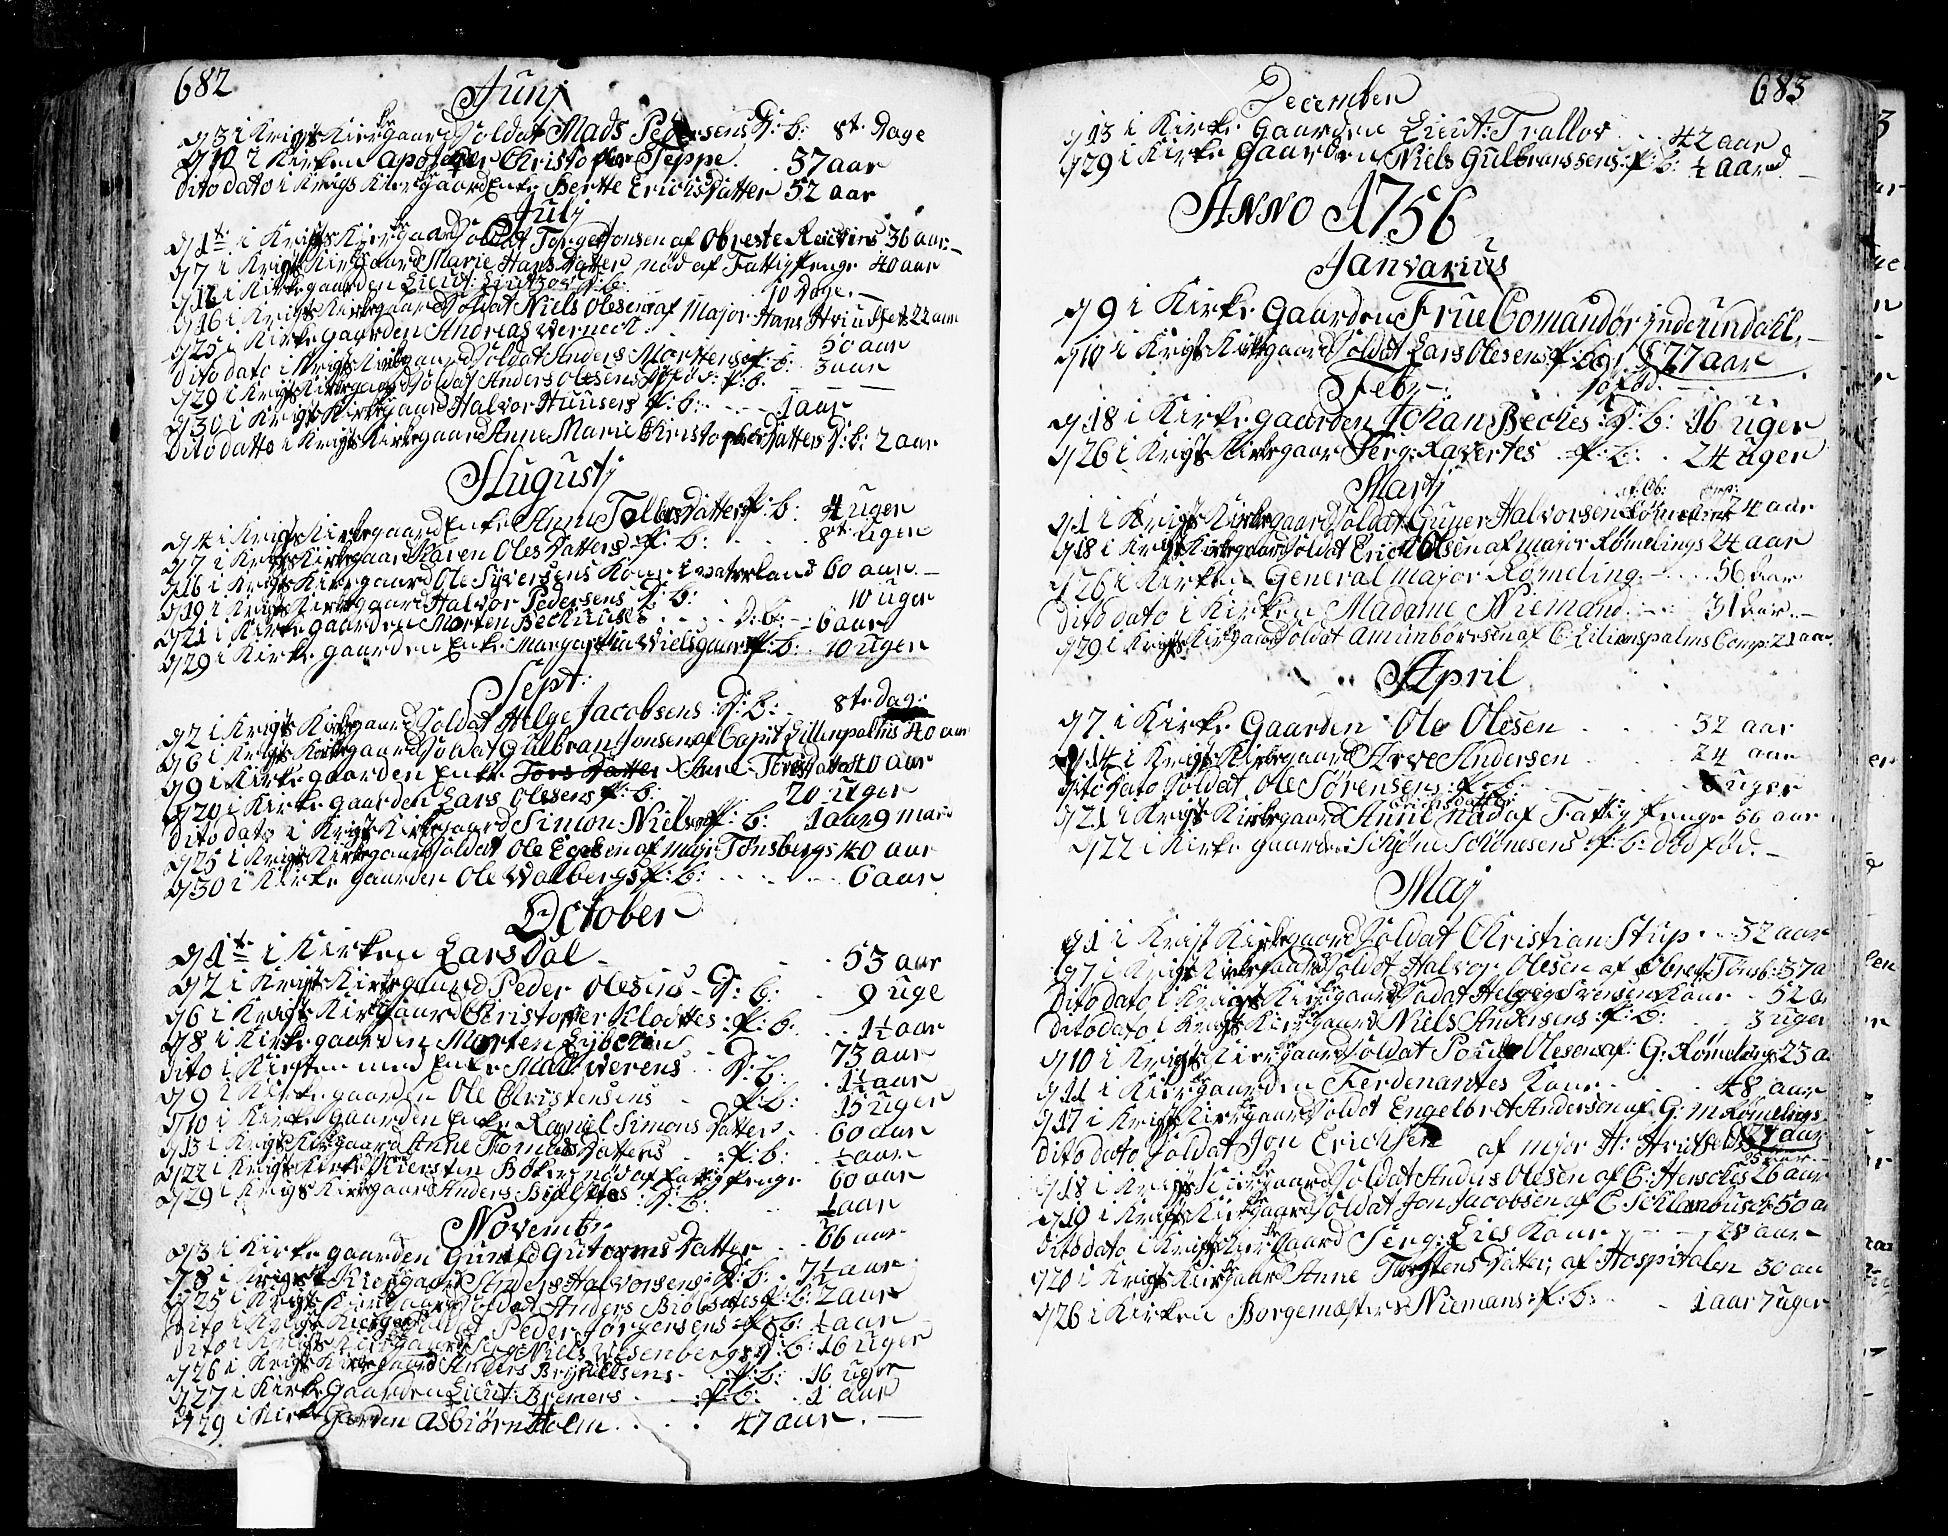 SAO, Fredrikstad prestekontor Kirkebøker, F/Fa/L0002: Ministerialbok nr. 2, 1750-1804, s. 682-683